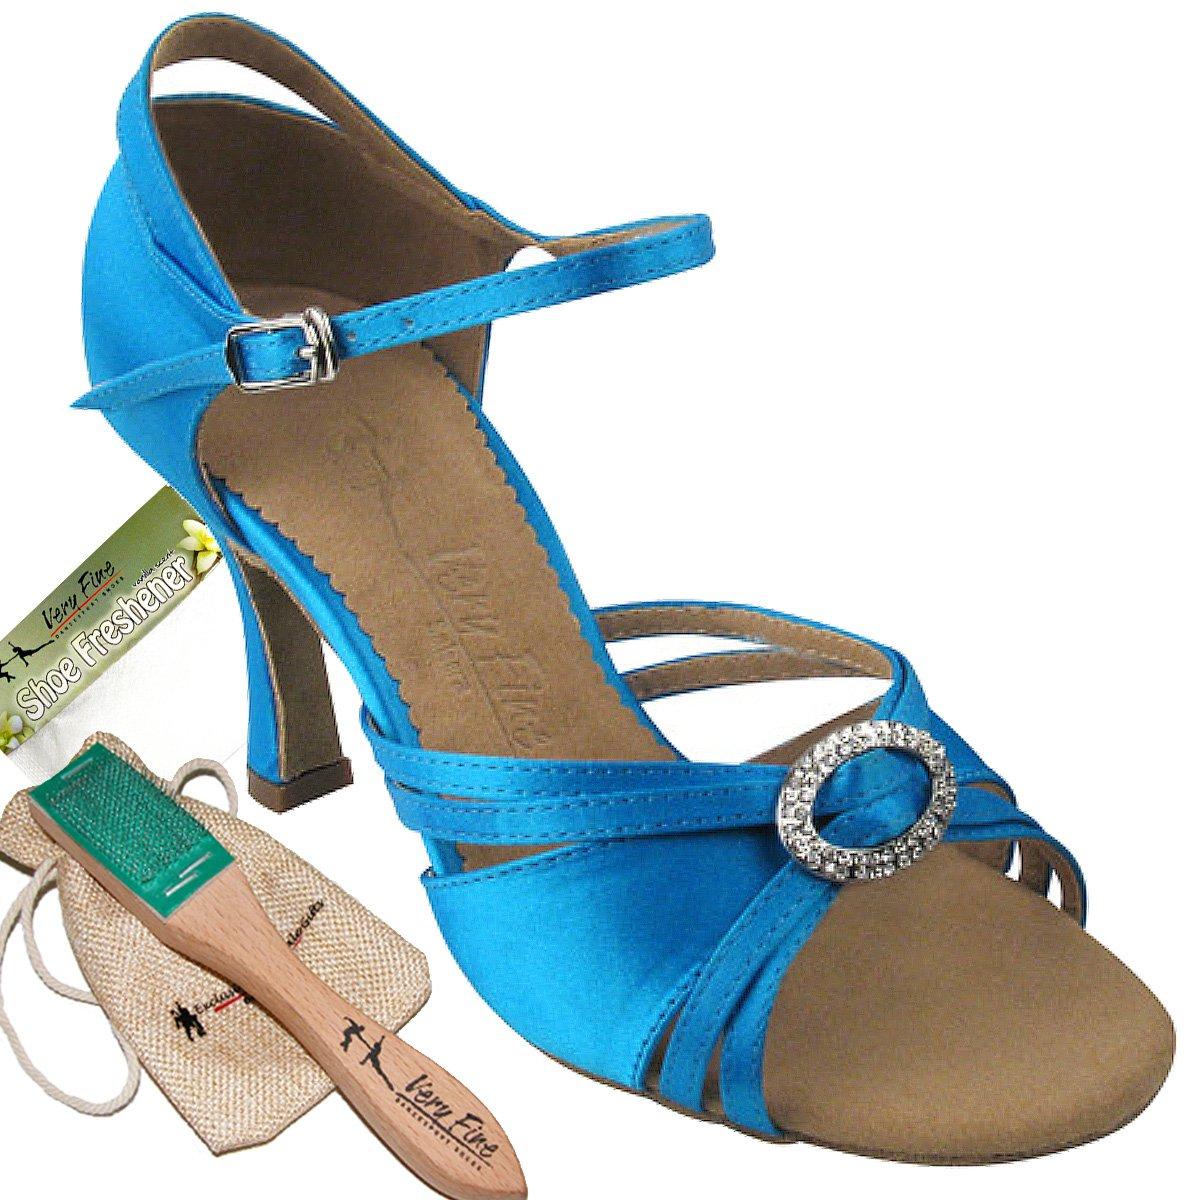 Women's Ballroom Dance Shoes Tango Wedding Salsa Dance Shoes Blue Sera1154EB Comfortable - Very Fine 2.5'' Heel 6.5 M US [Bundle of 5]